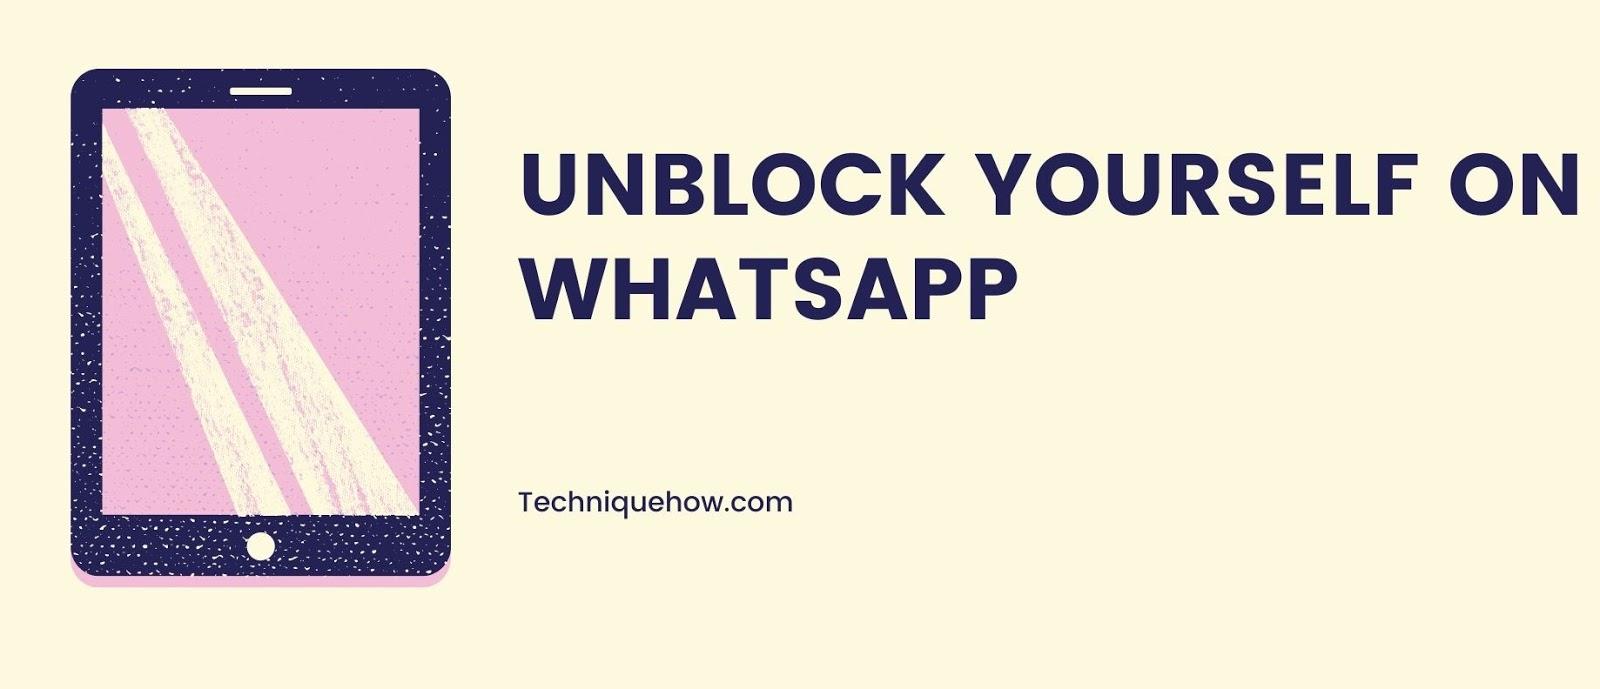 unblock myself